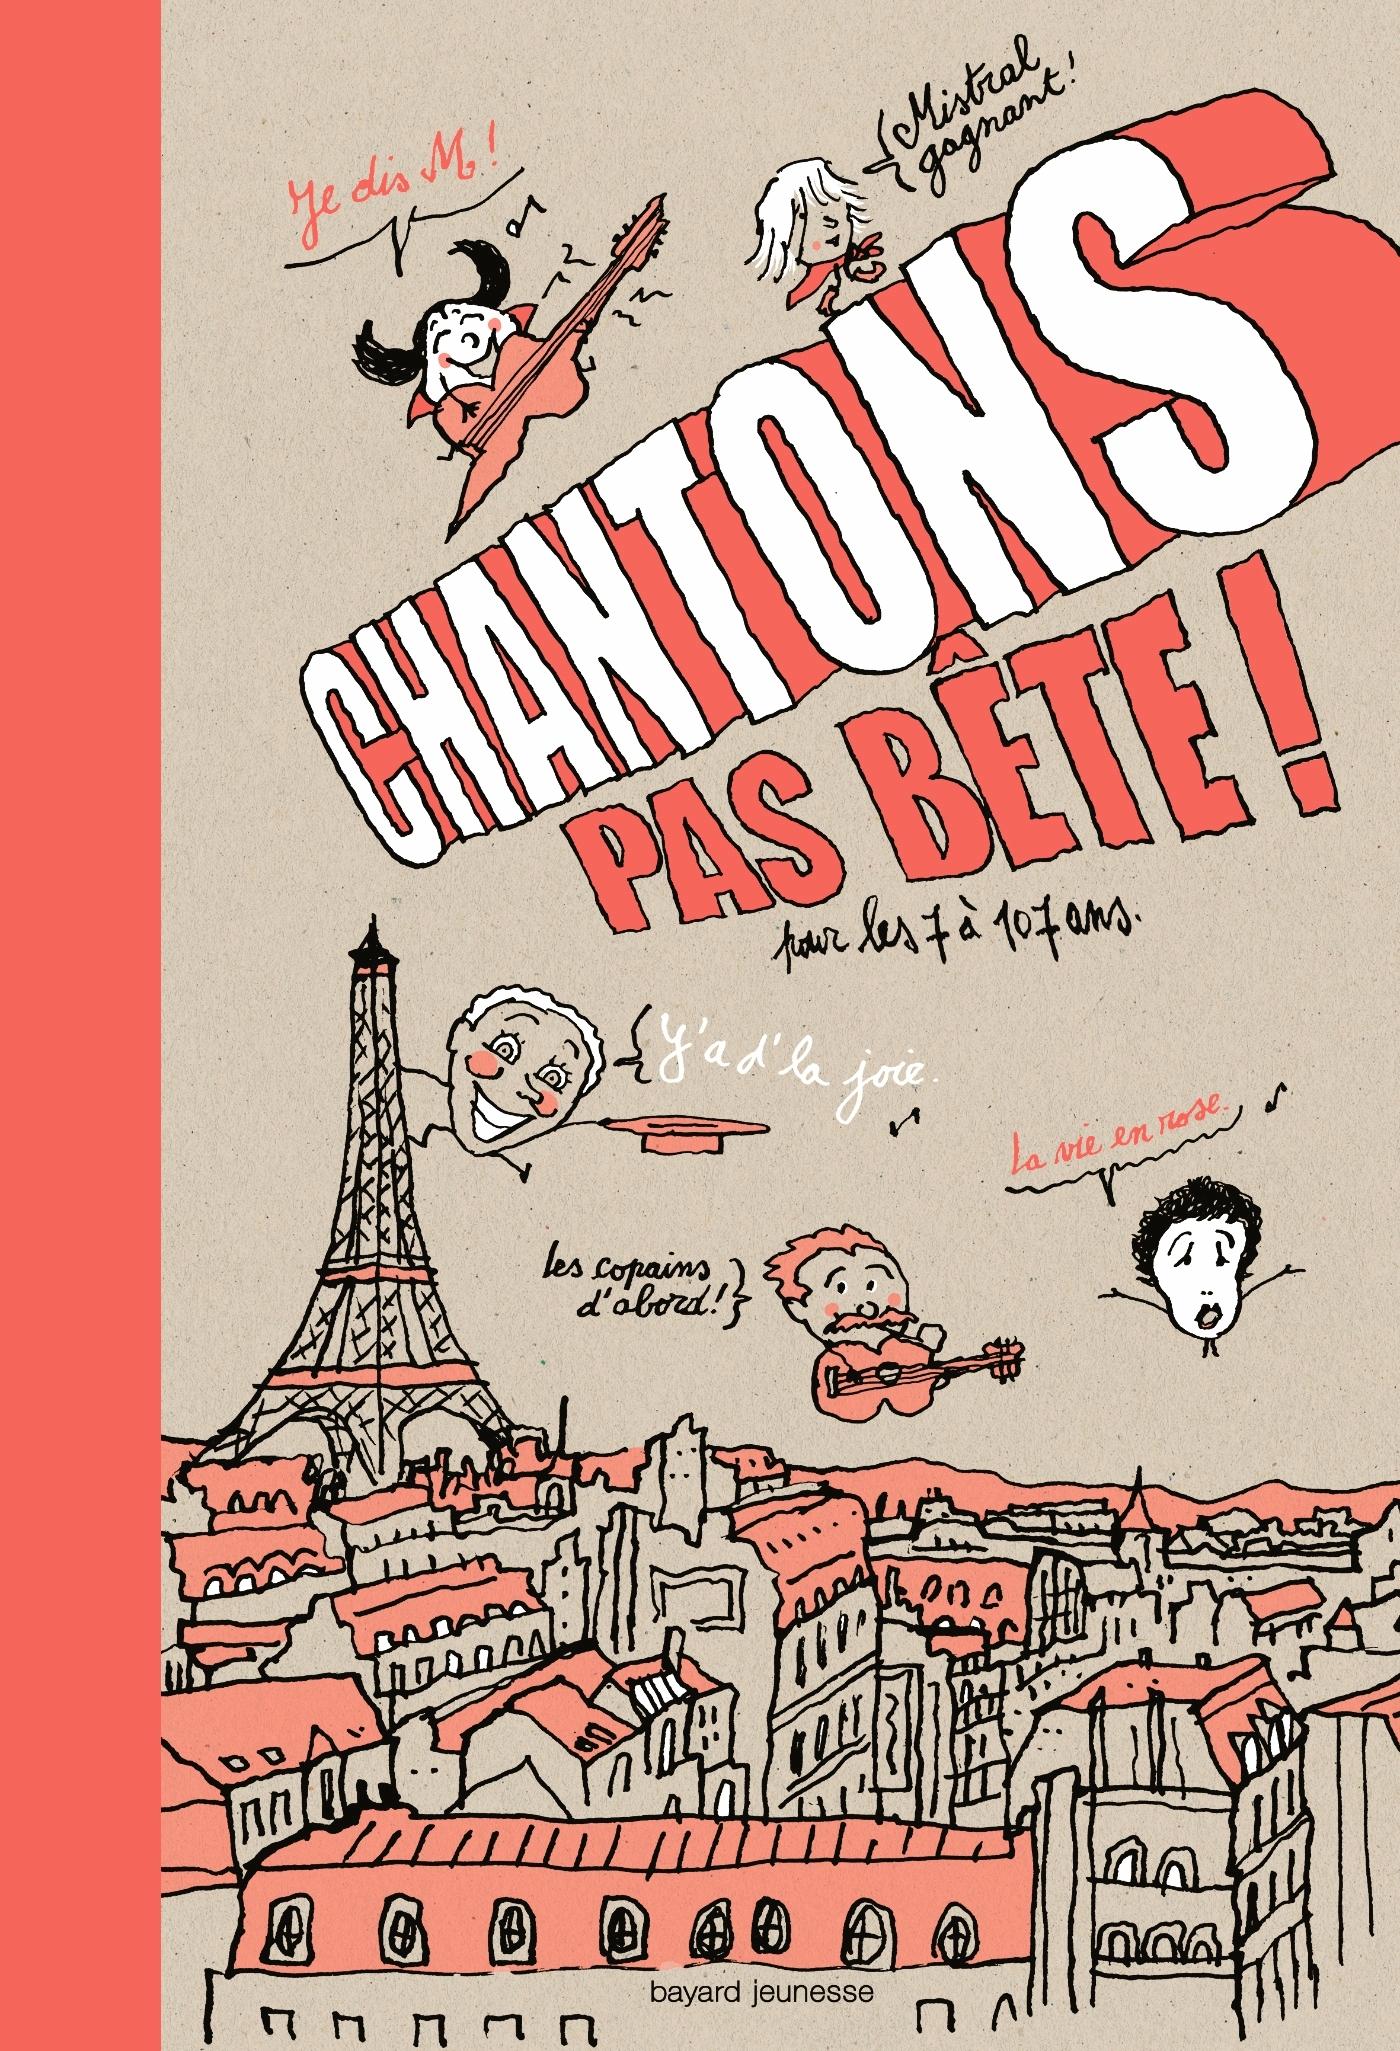 CHANTONS PAS BETE !